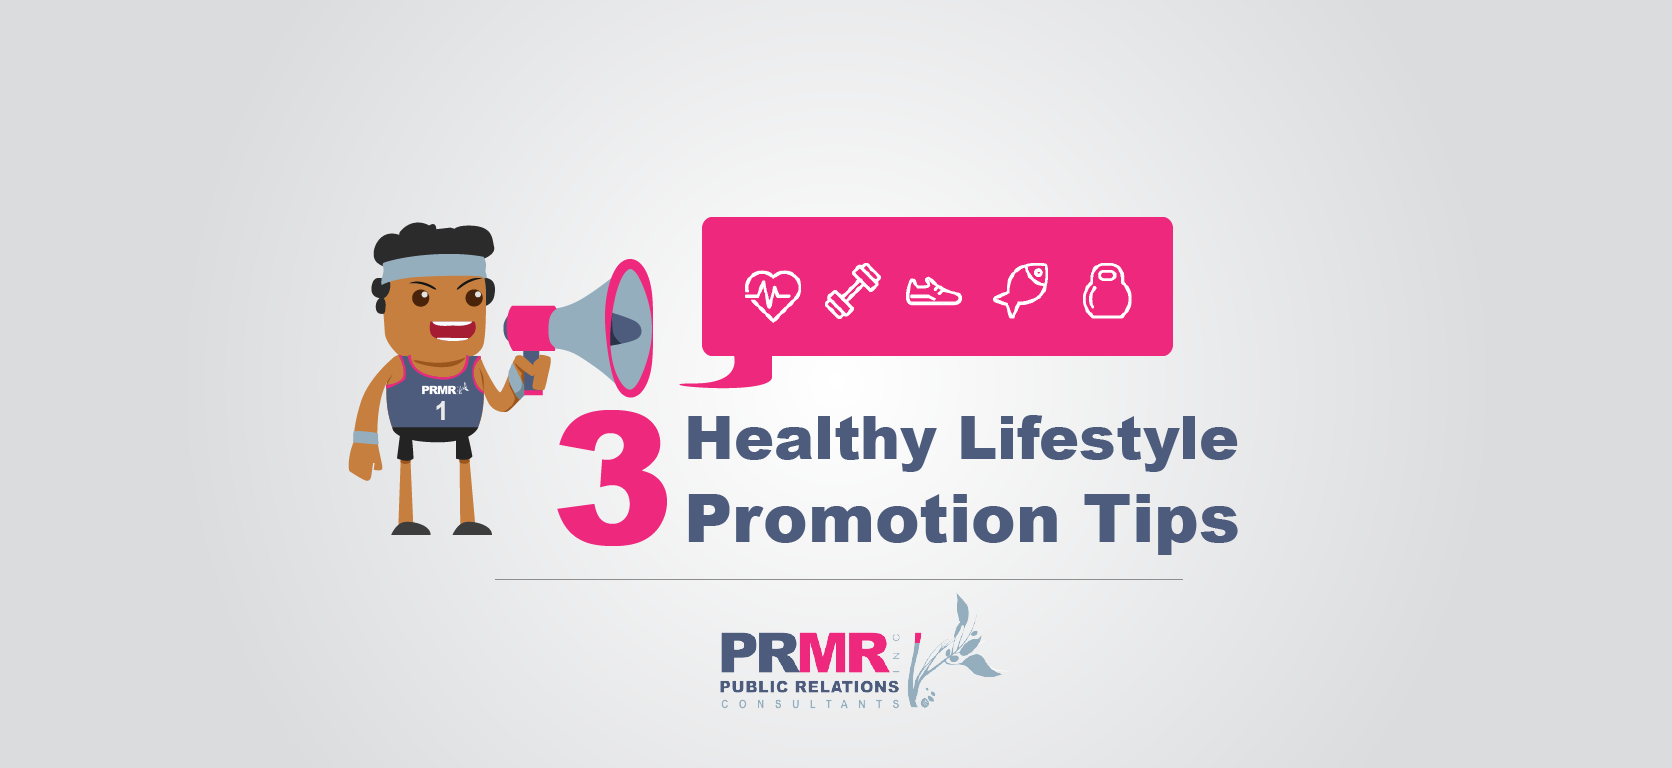 Three ways to promote healthy lifestyles